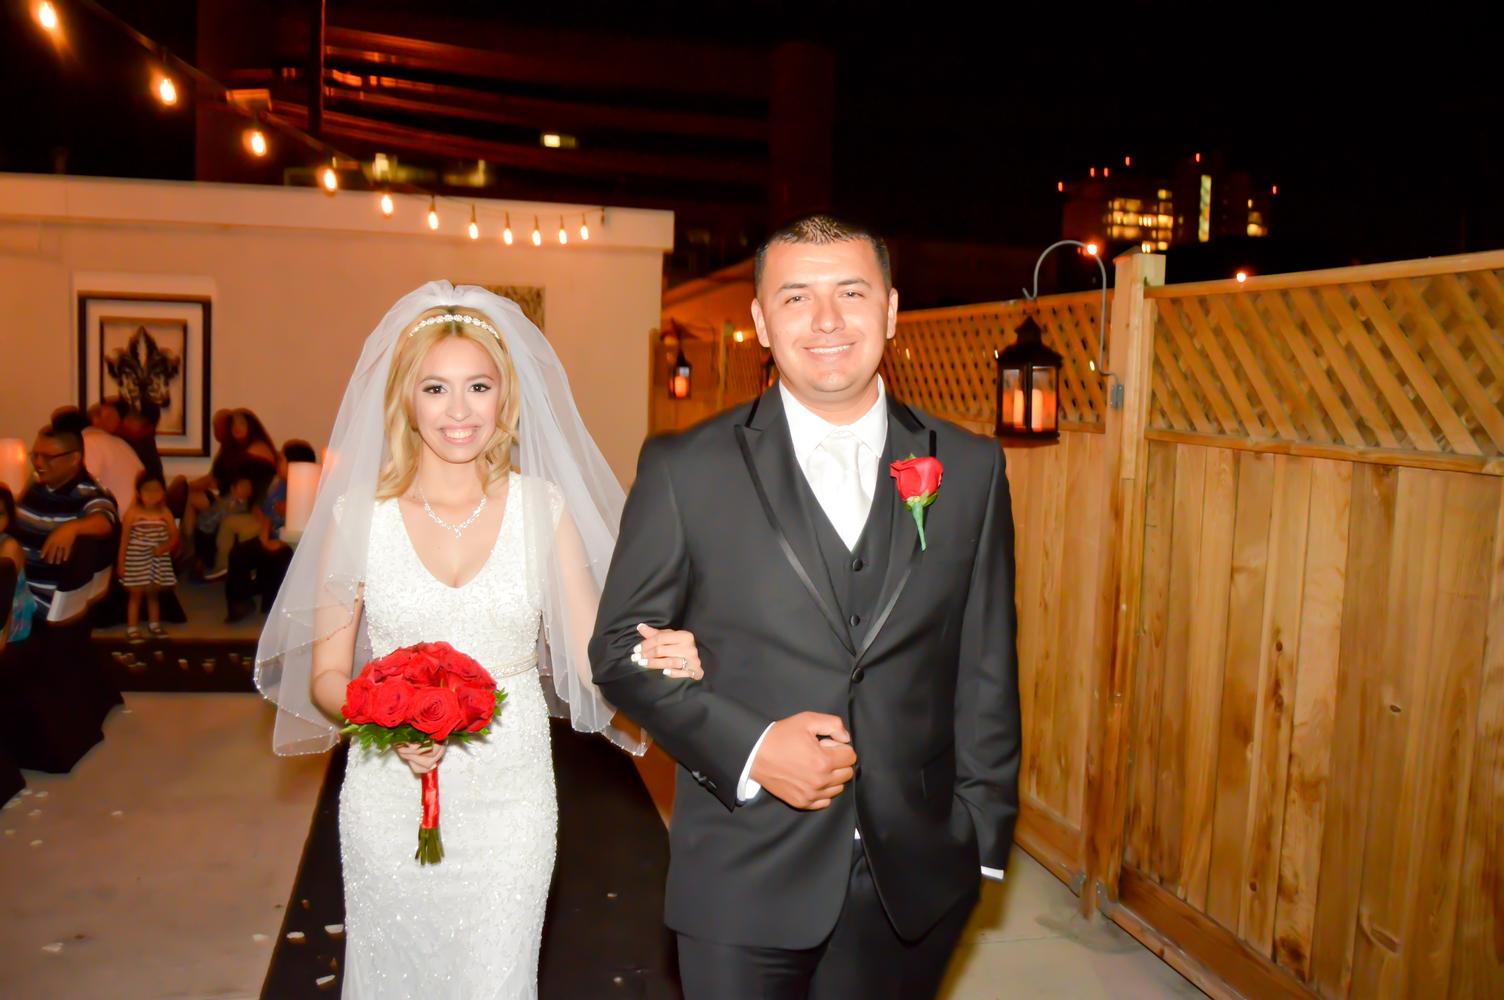 Pavilion Wedding At Night Outdoors On The Las Vegas Strip